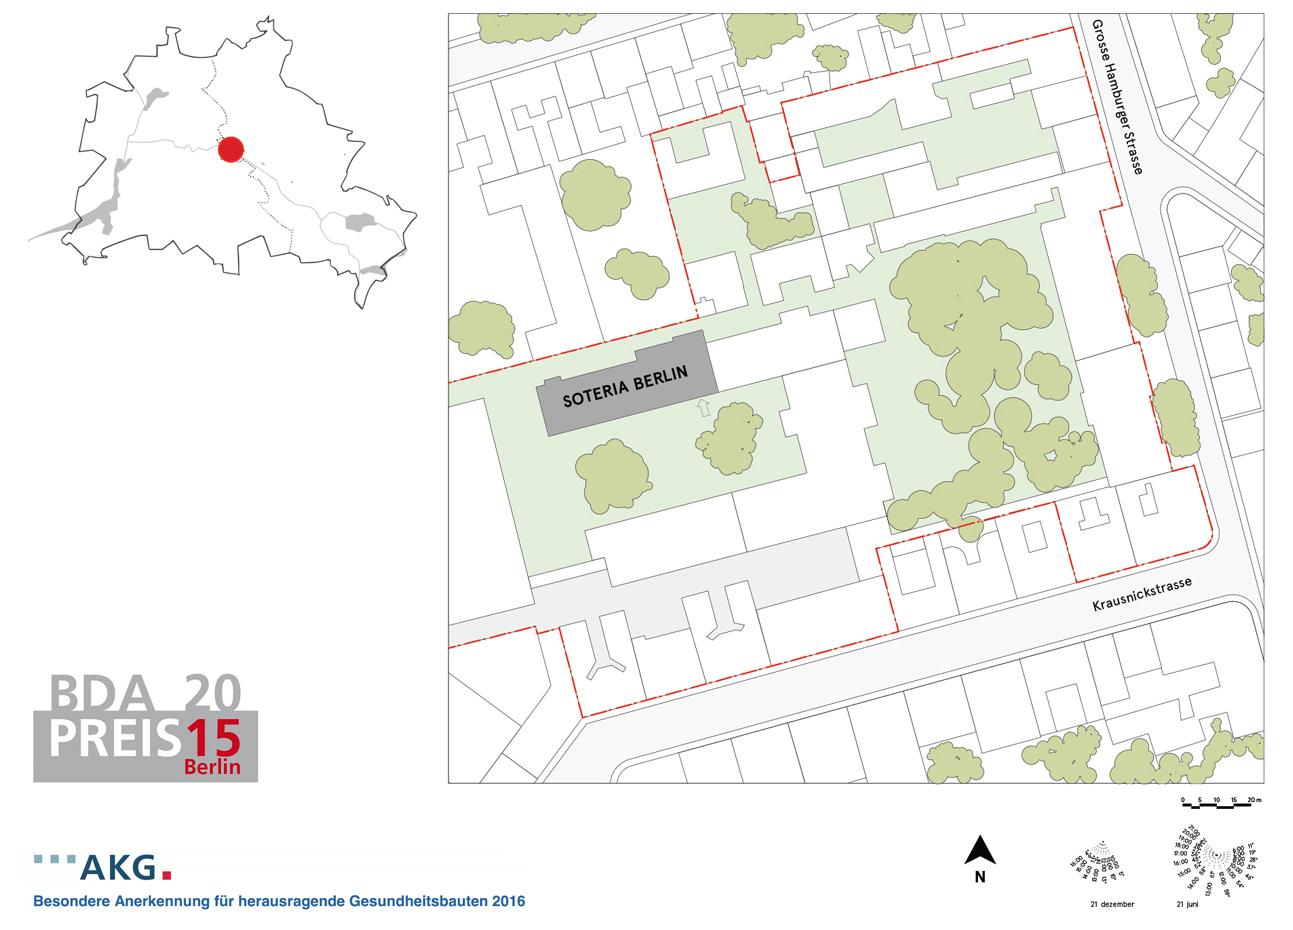 SOTERIA BERLIN - LOCATION / DATA